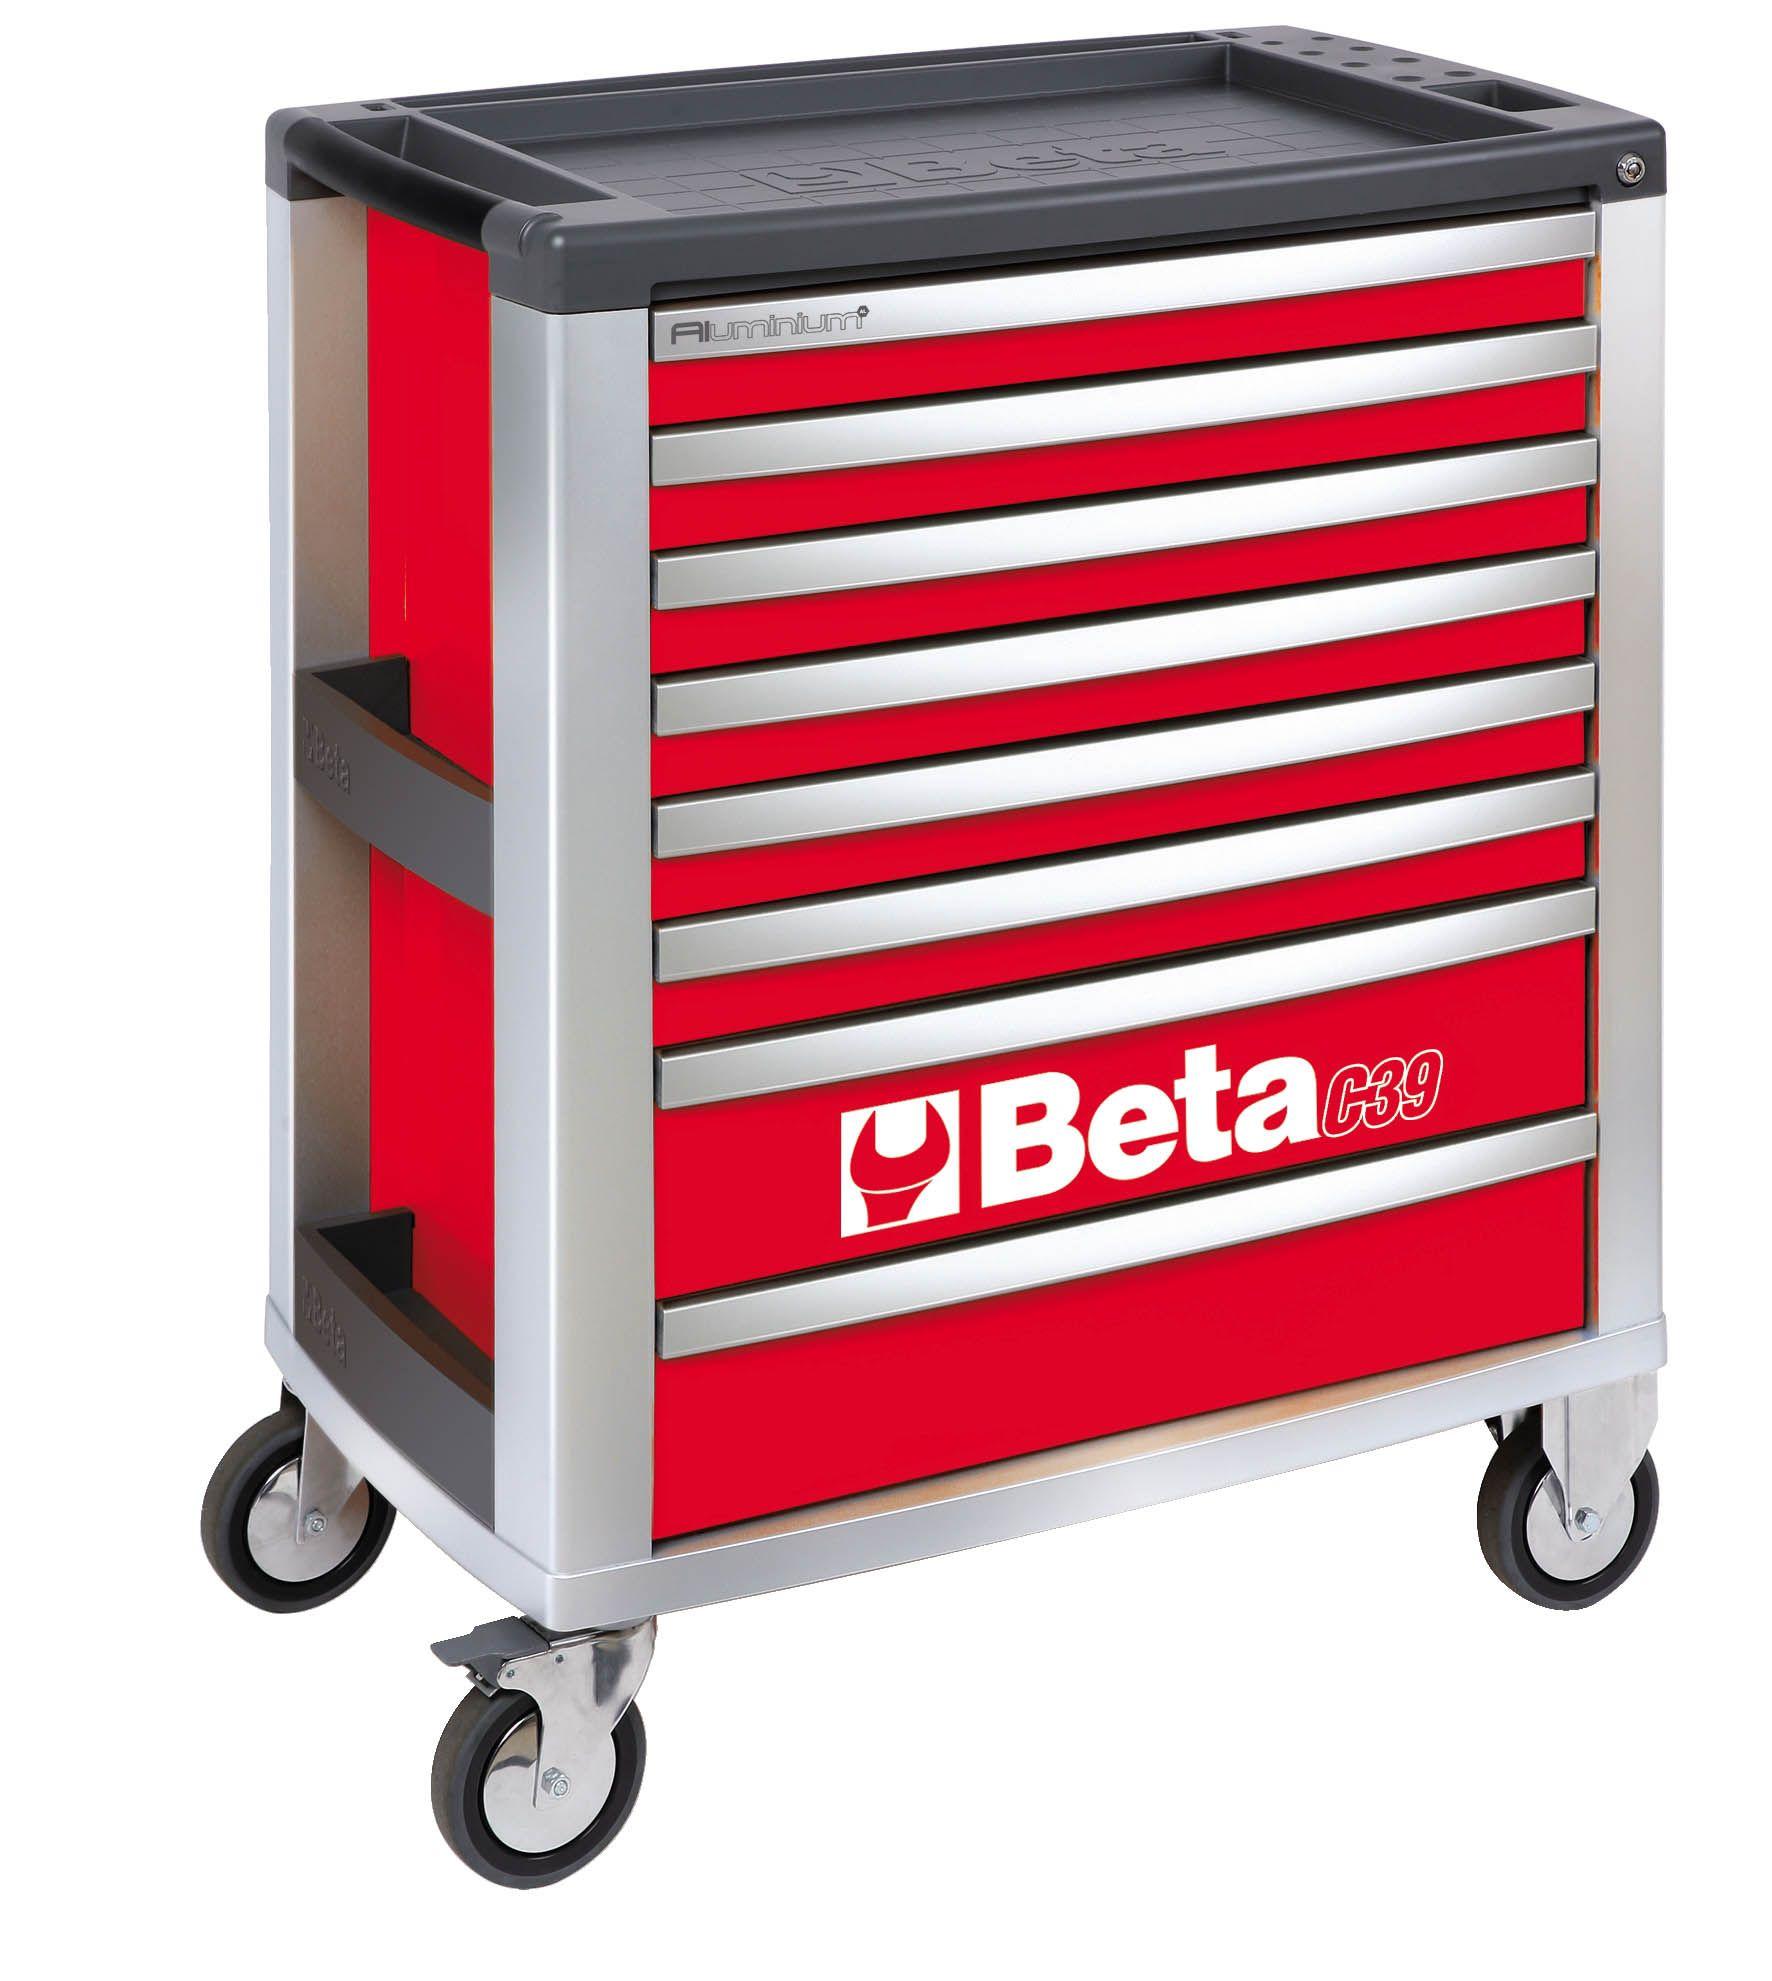 Beta Tools C39 8 Drawer Mobile Roller Cabinet Tool Box